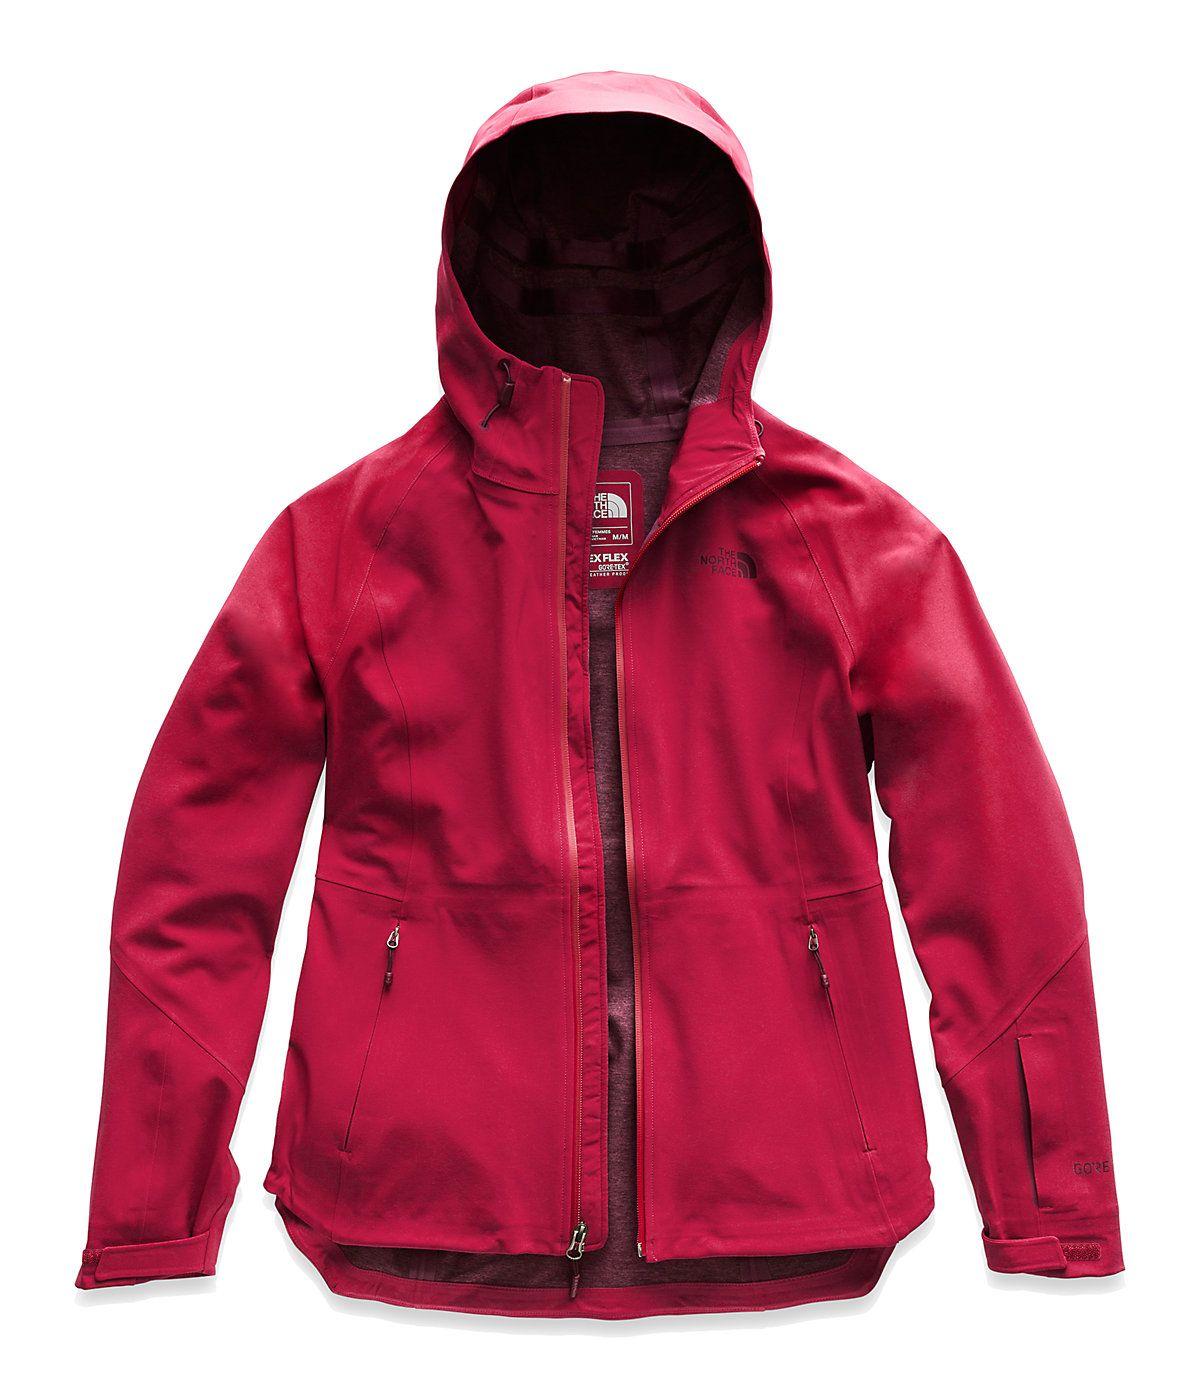 22047997760 The North Face Women s Apex Flex GTX Rain Jacket